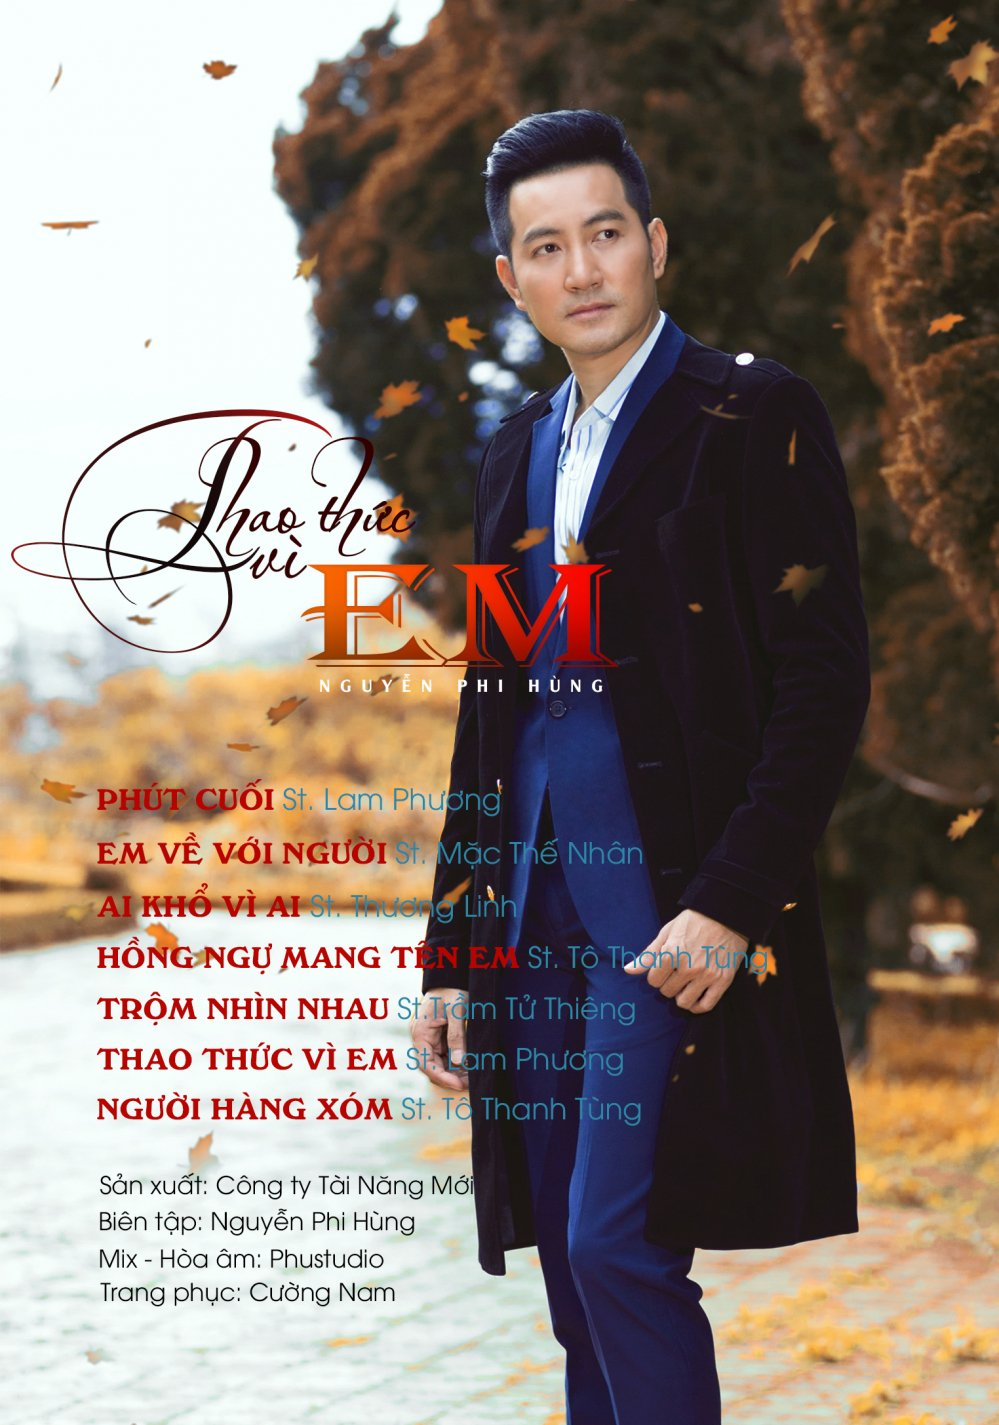 Nguyen Phi Hung gay ngac nhien khi re huong sang dong nhac Bolero hinh anh 1